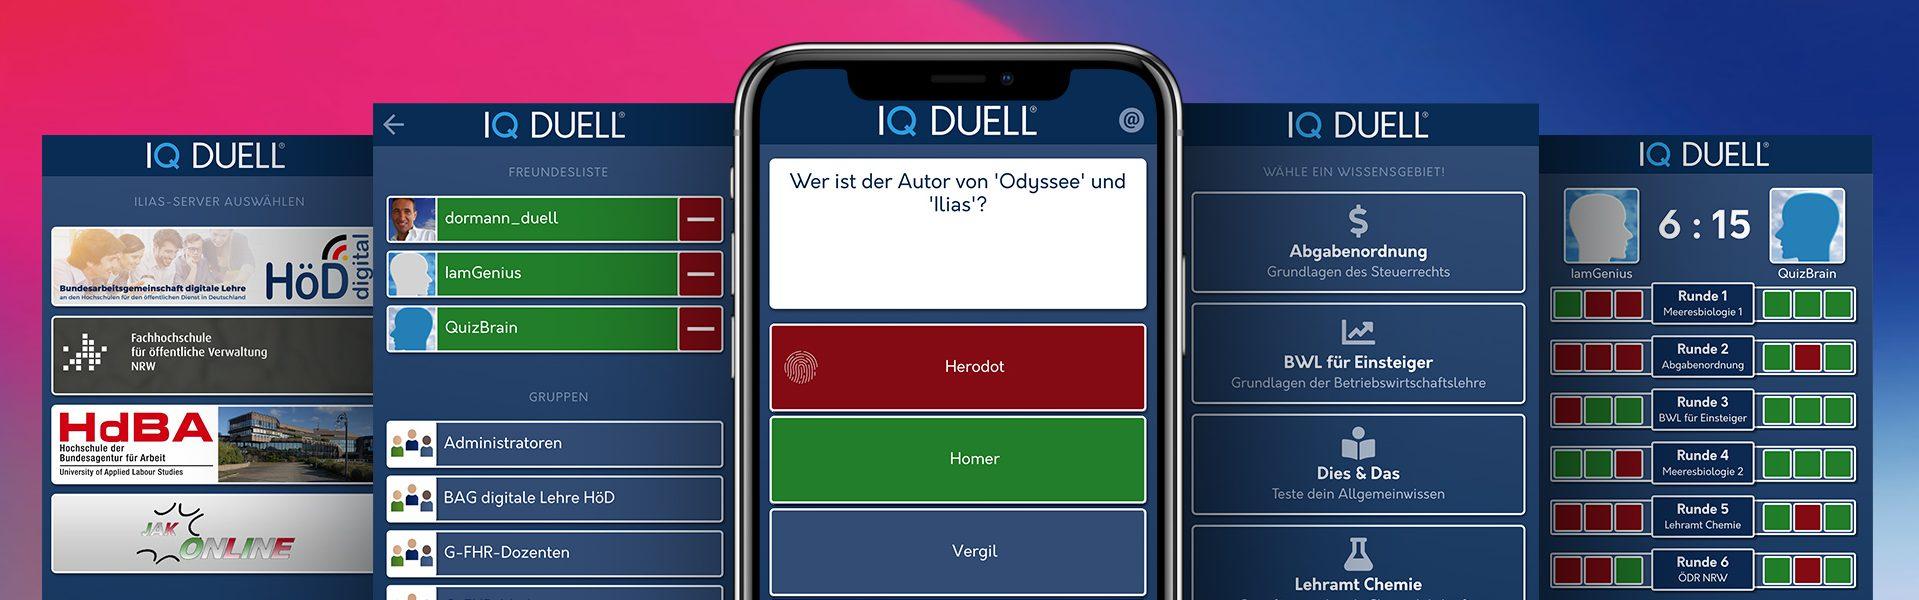 IQ-DUELL